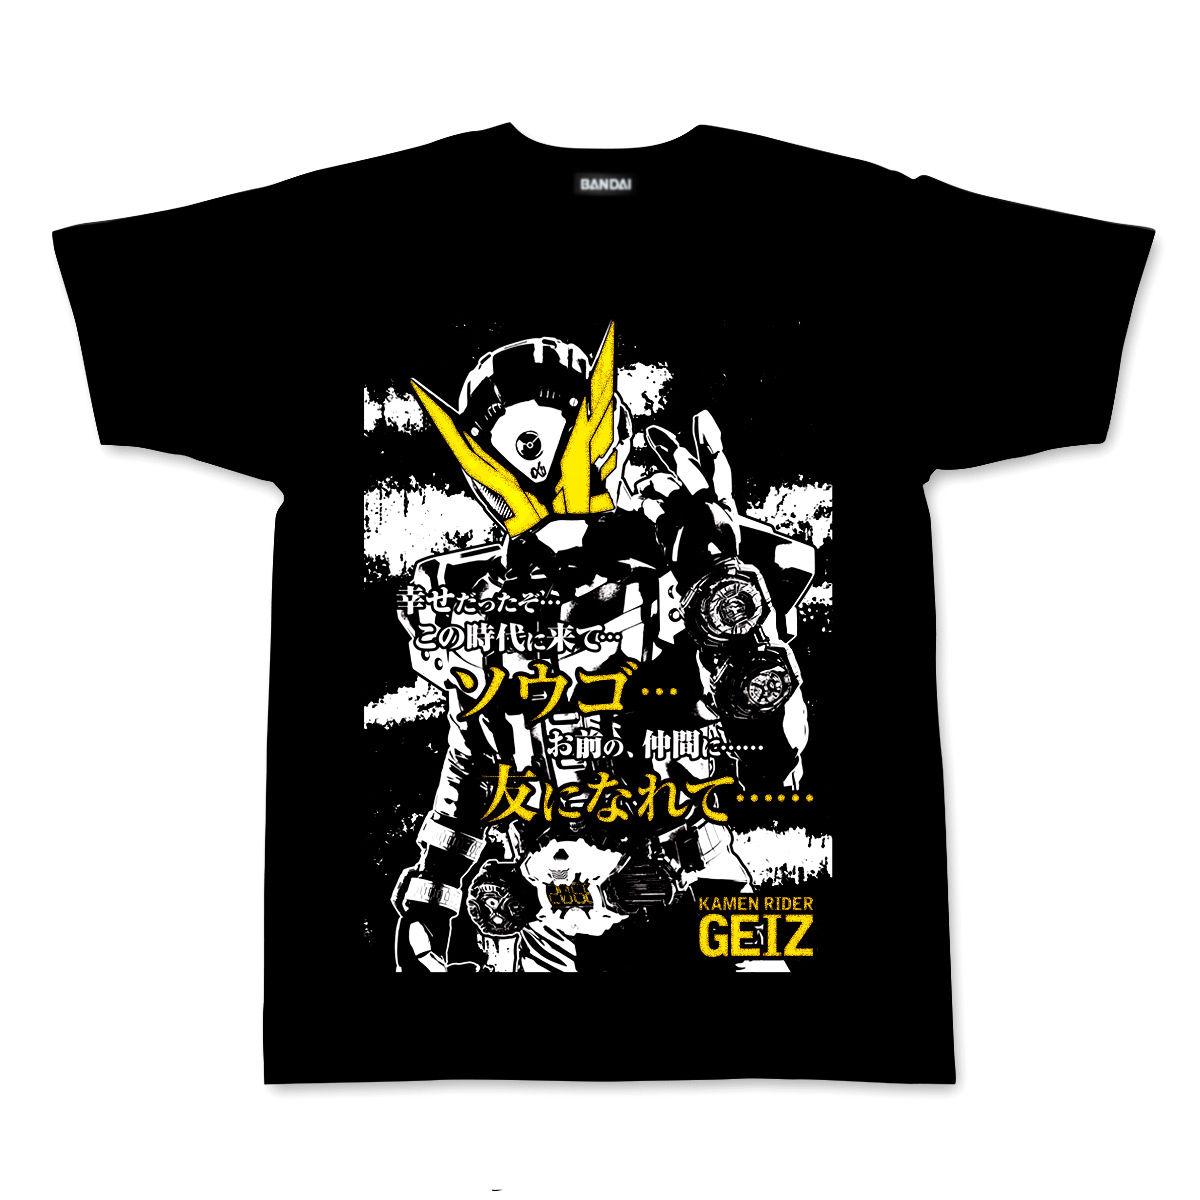 Kamen Rider Zi-O Climax Scene T-shirt - Kamen Rider Geiz ver.